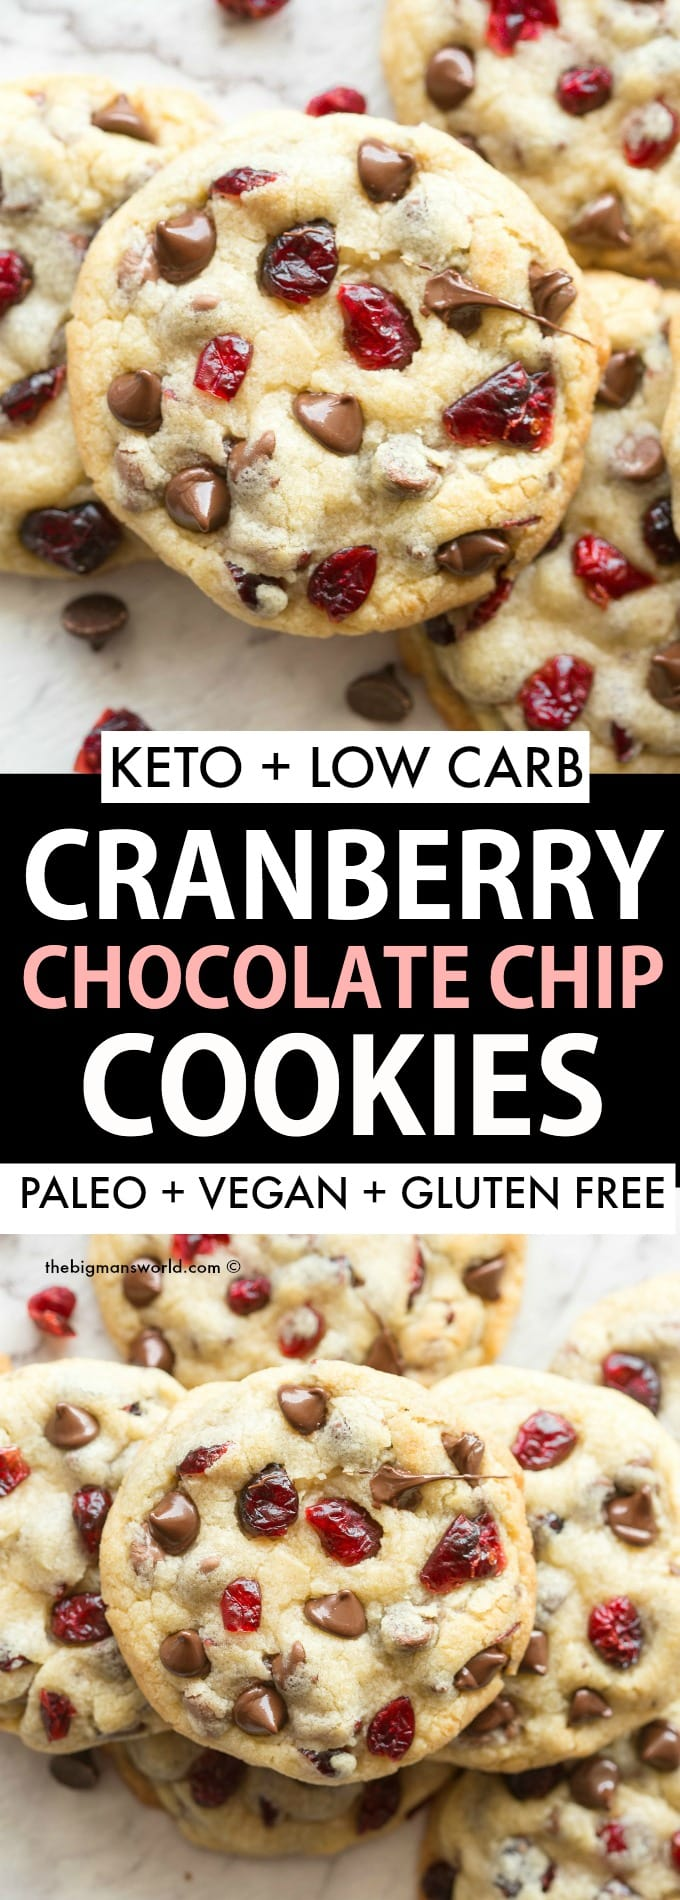 Keto Cranberry Chocolate Chip Cookies Recipe